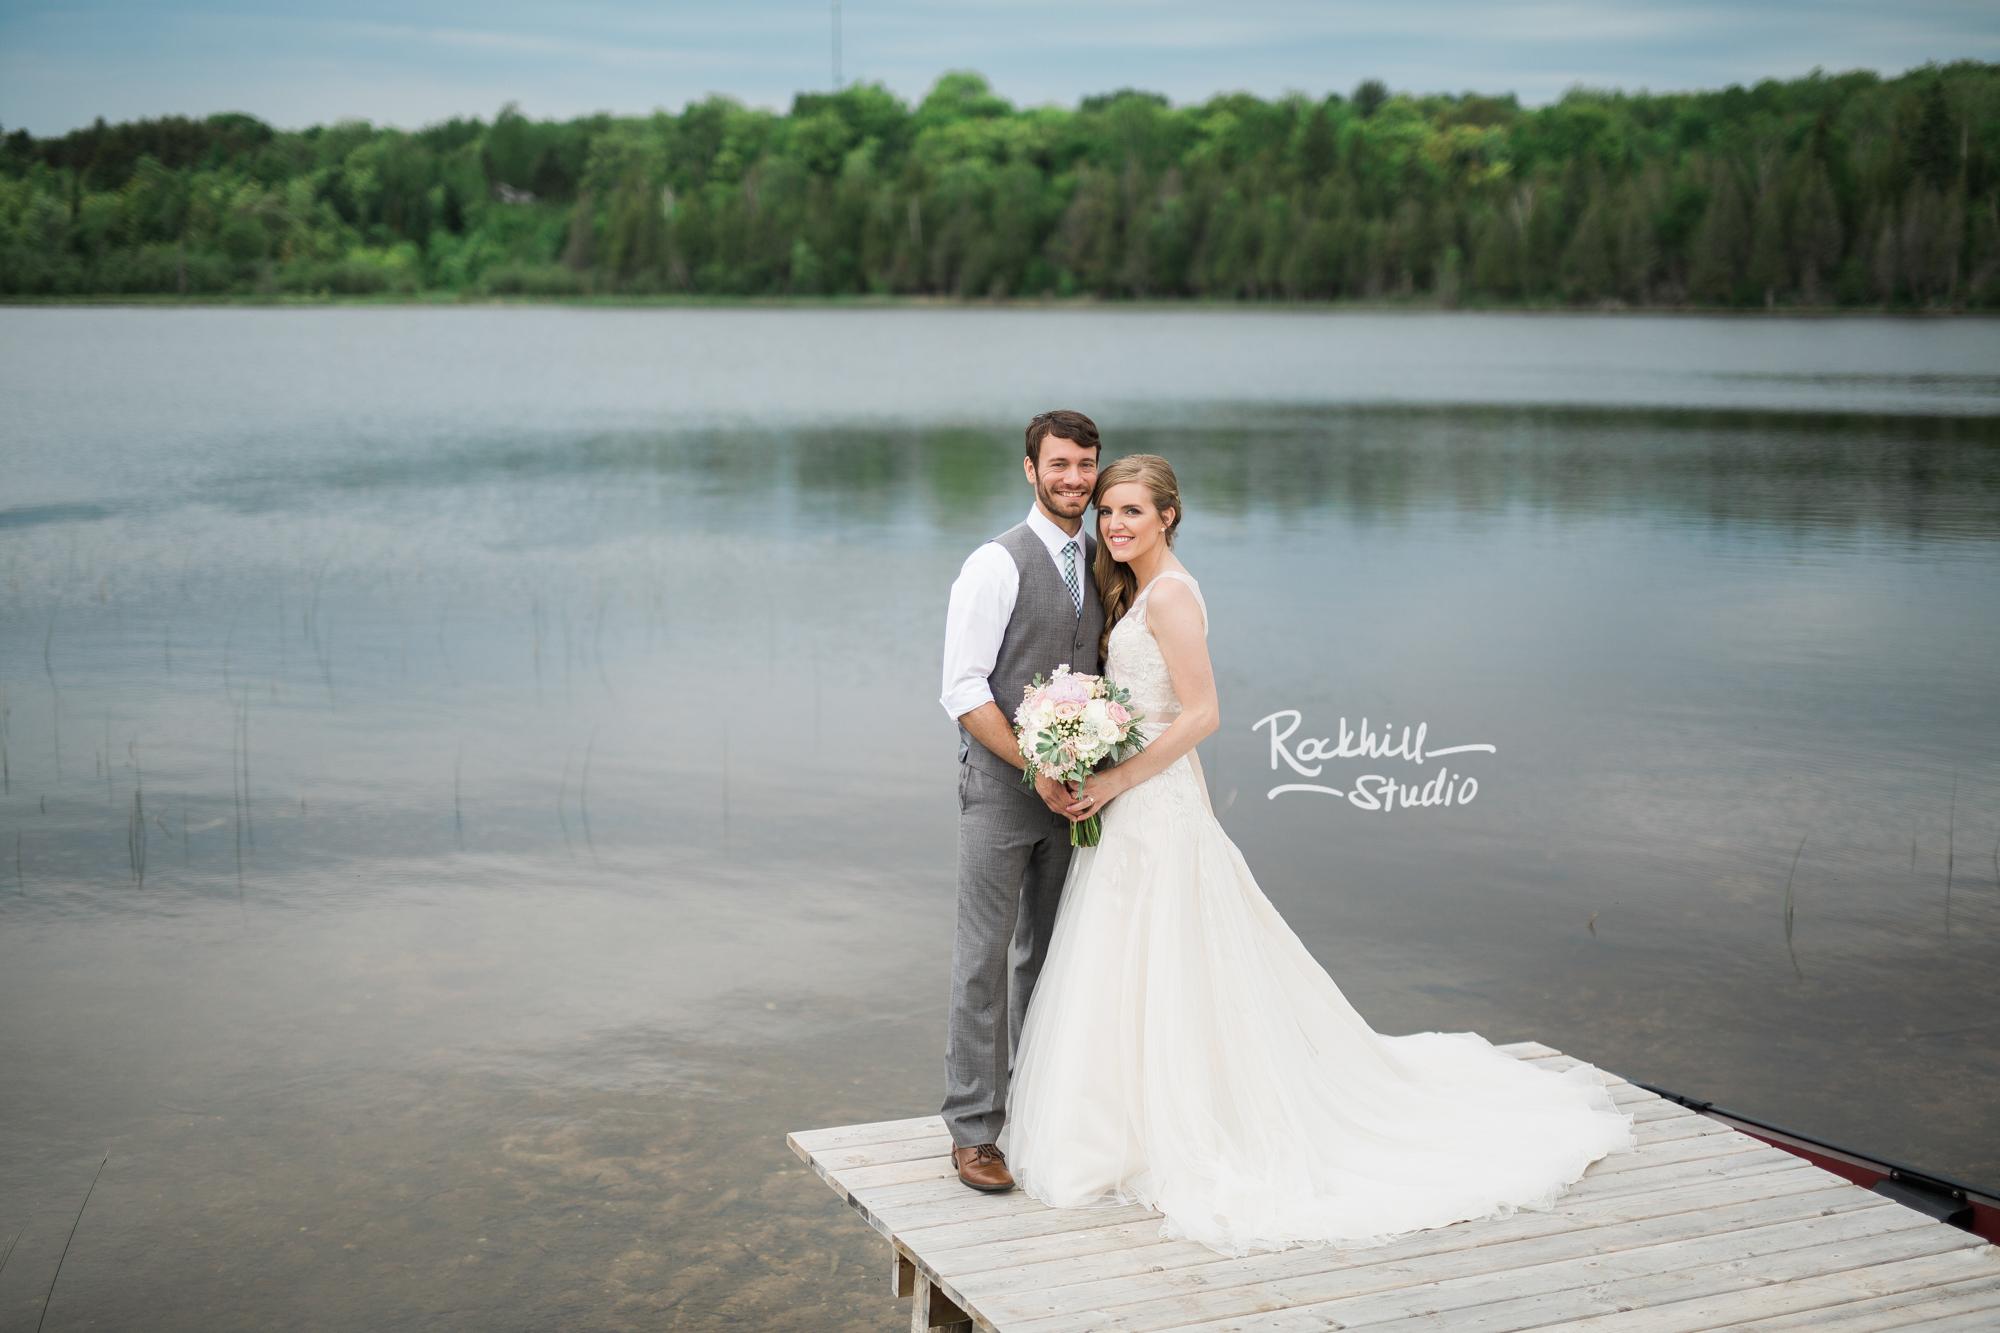 marquette-michigan-wedding-upper-peninsula-spring-photography-rockhill-ee-43.jpg